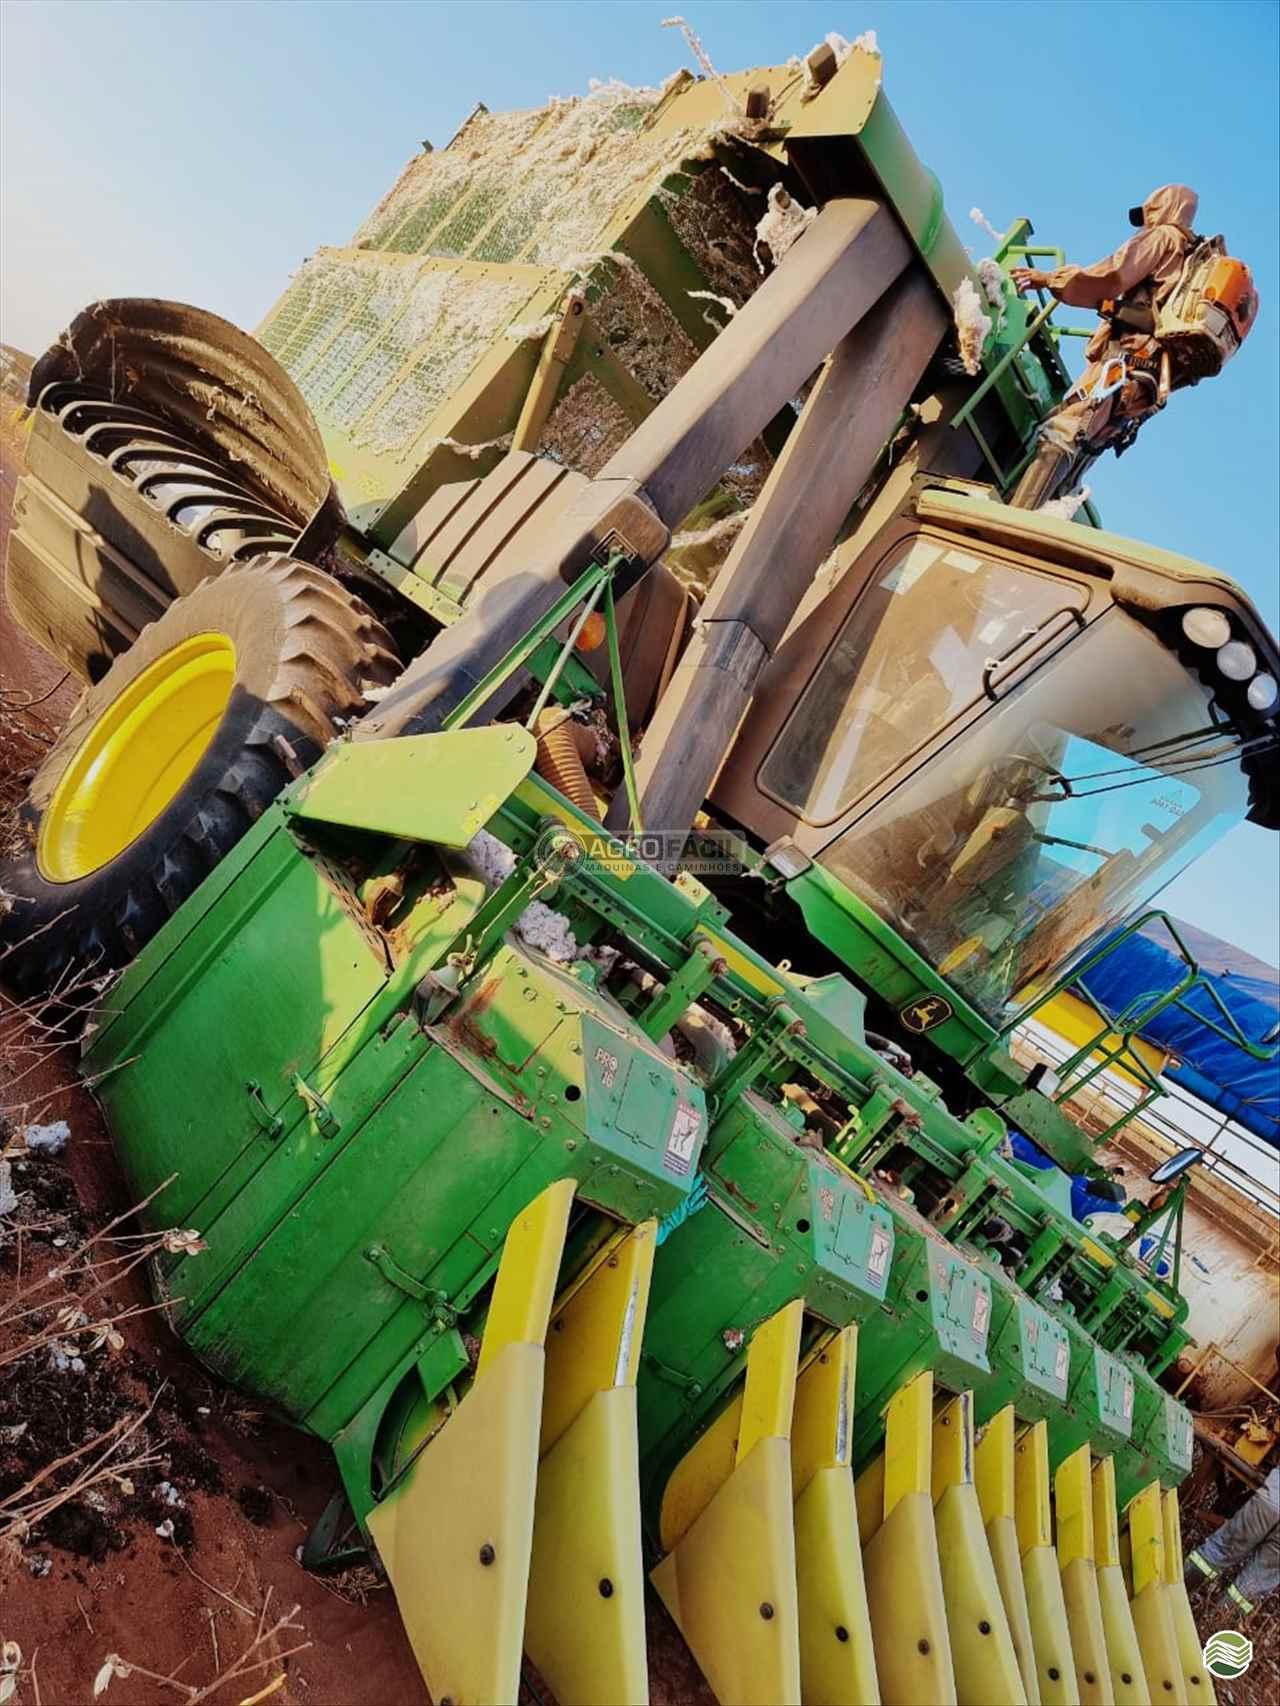 JOHN DEERE ALG. 7660 de Agro Fácil Máquinas - PRIMAVERA DO LESTE/MT